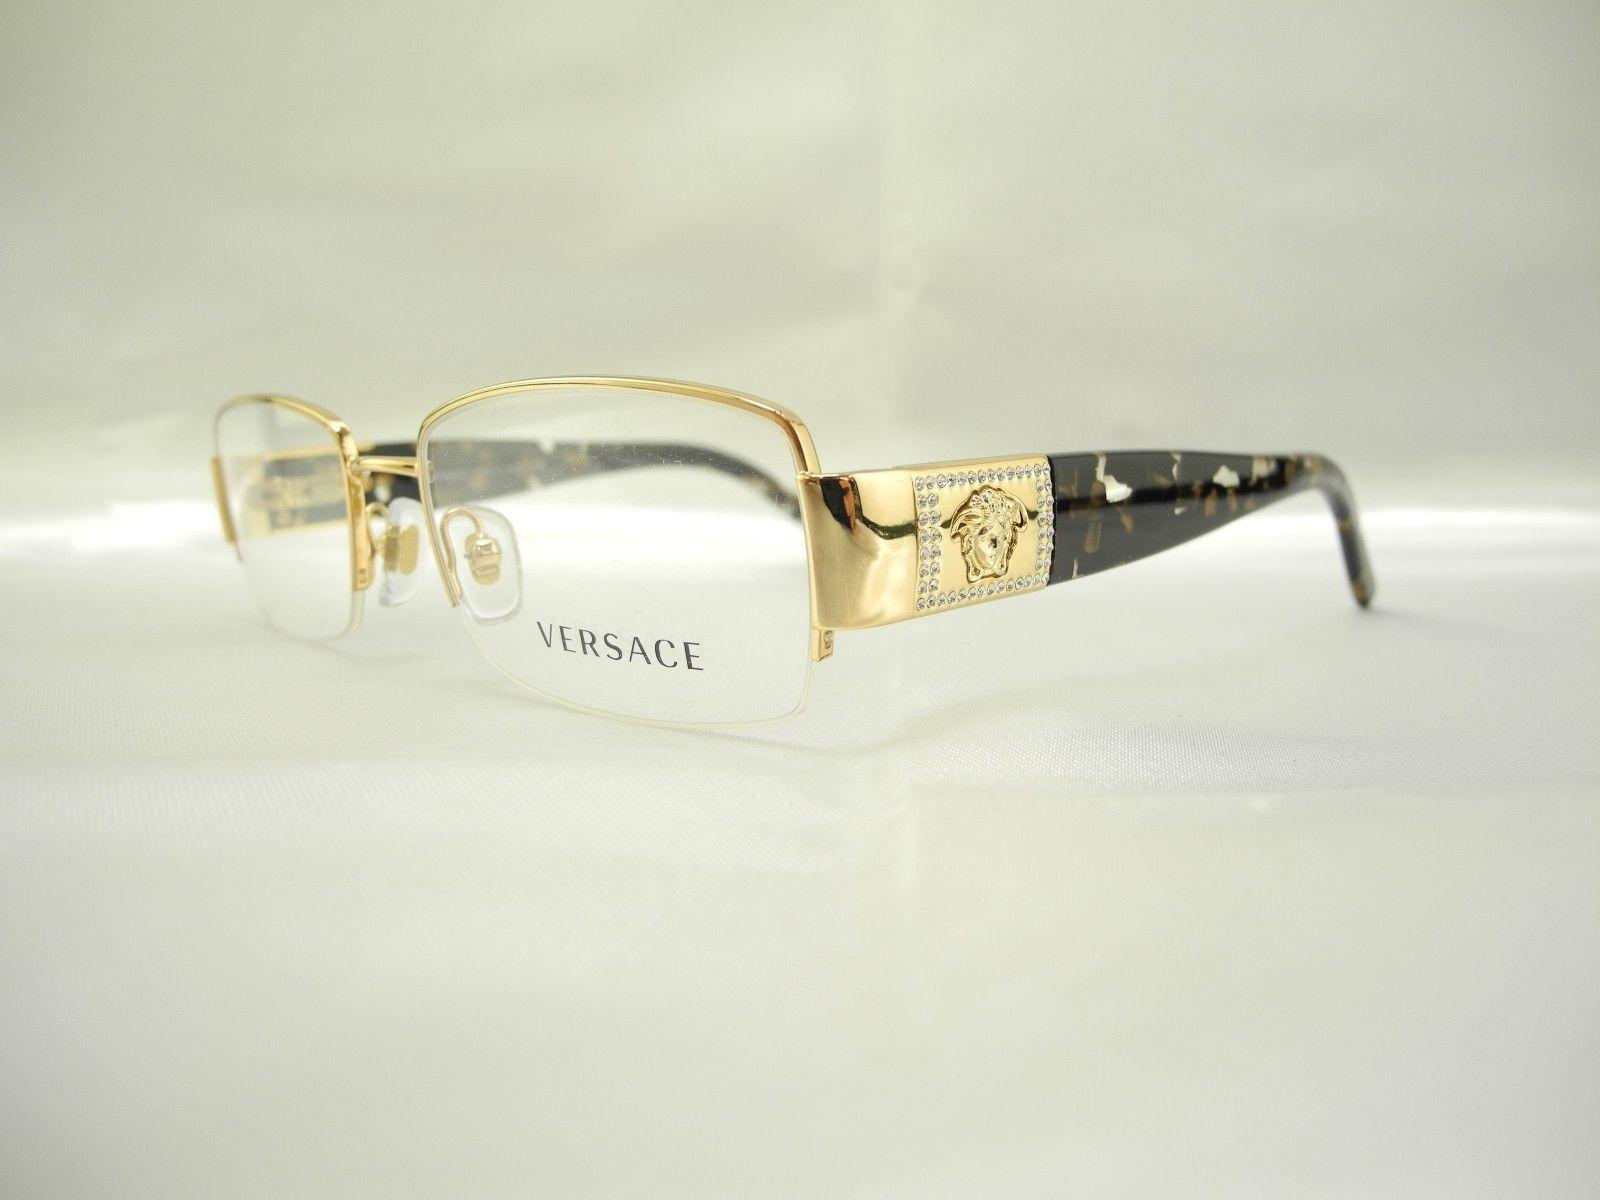 Versace Eyeglass Frames With Rhinestones : New Versace 1175-B 1002 Gold Rhinestone Metal Semi ...